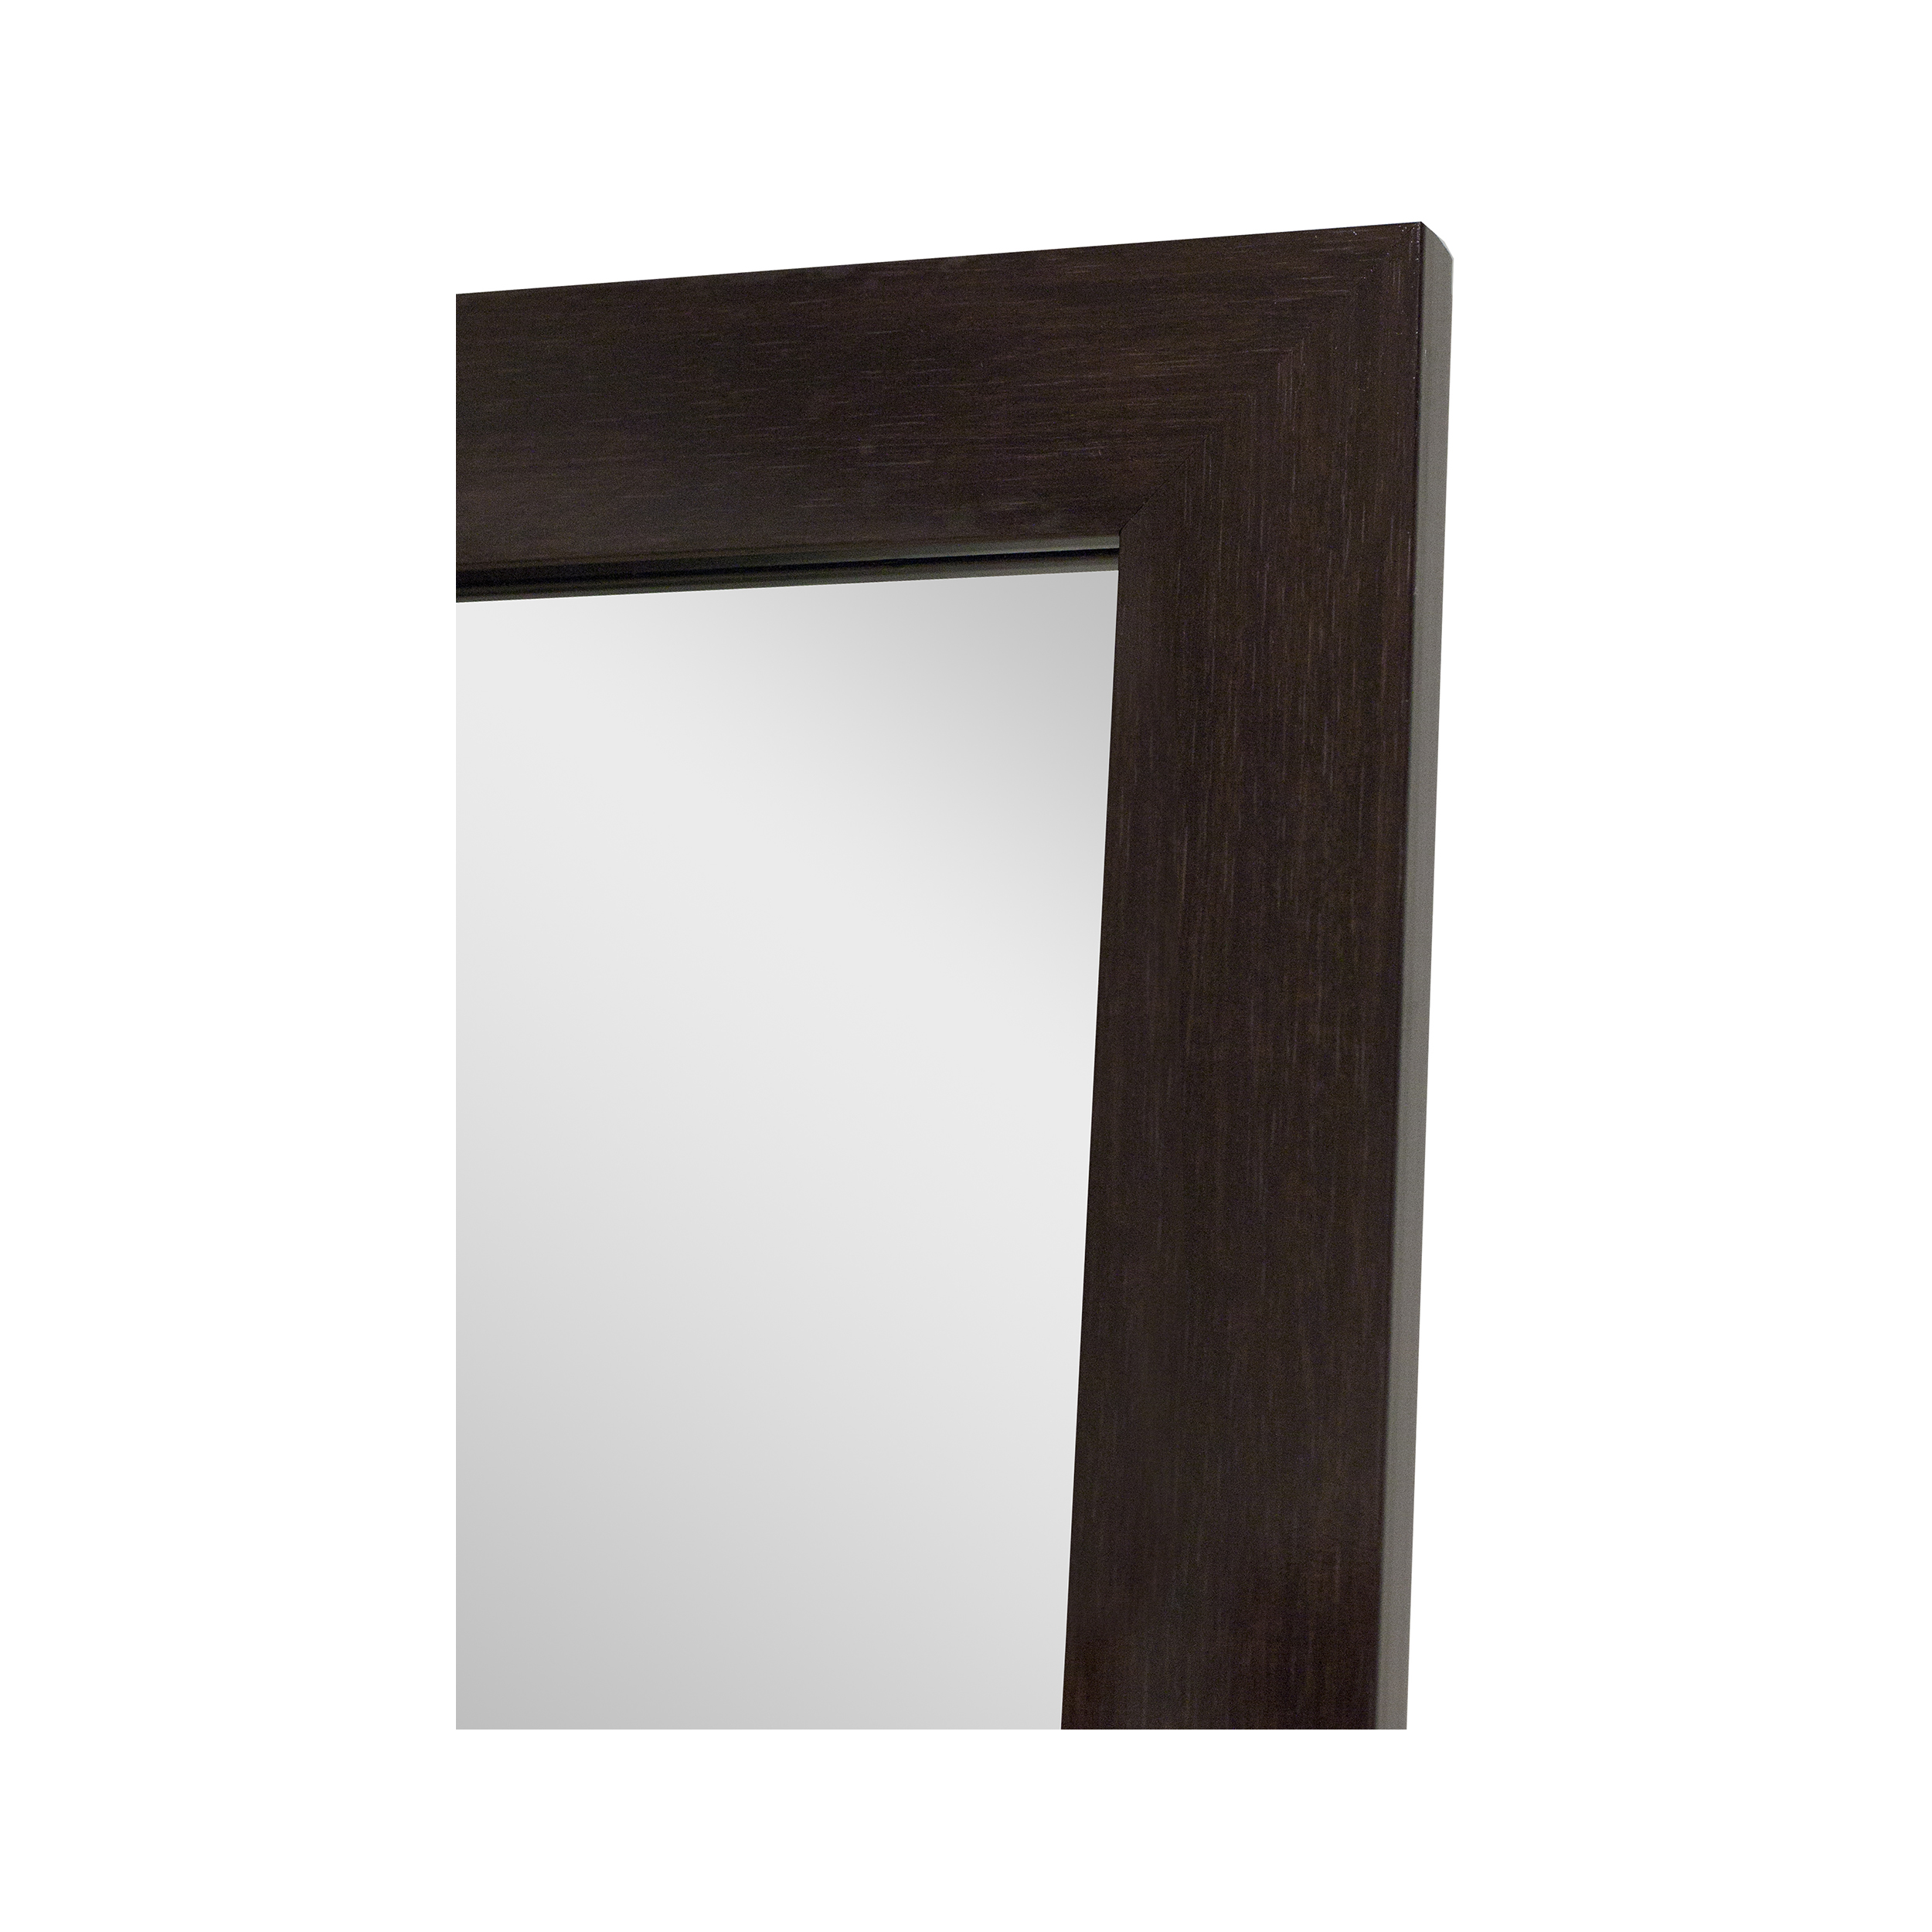 "Ipe Brown Non-Beveled Vanity (28"" x 42"")"